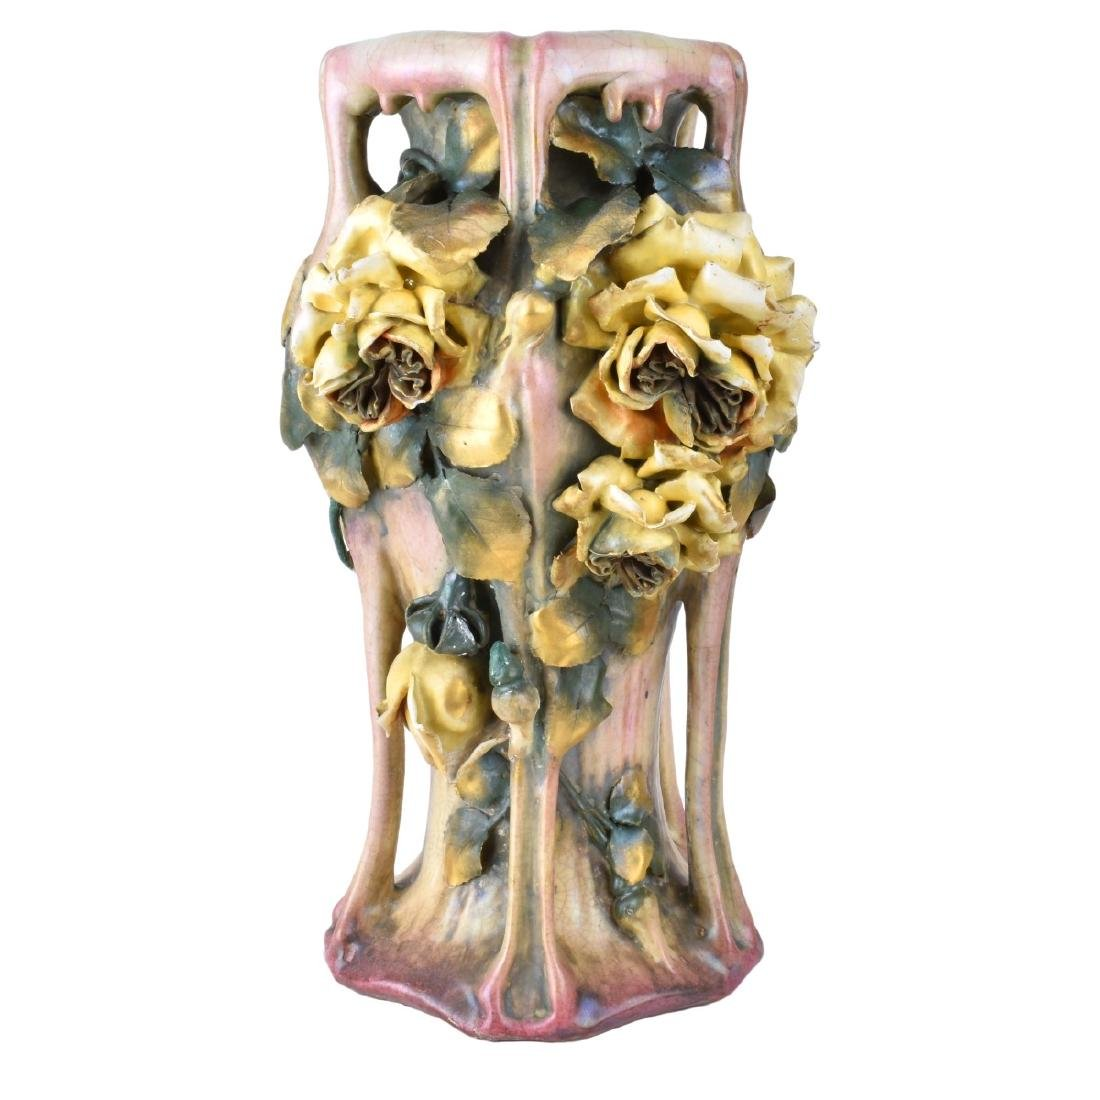 Amphora Edda Pottery Vase with Raised Flowers